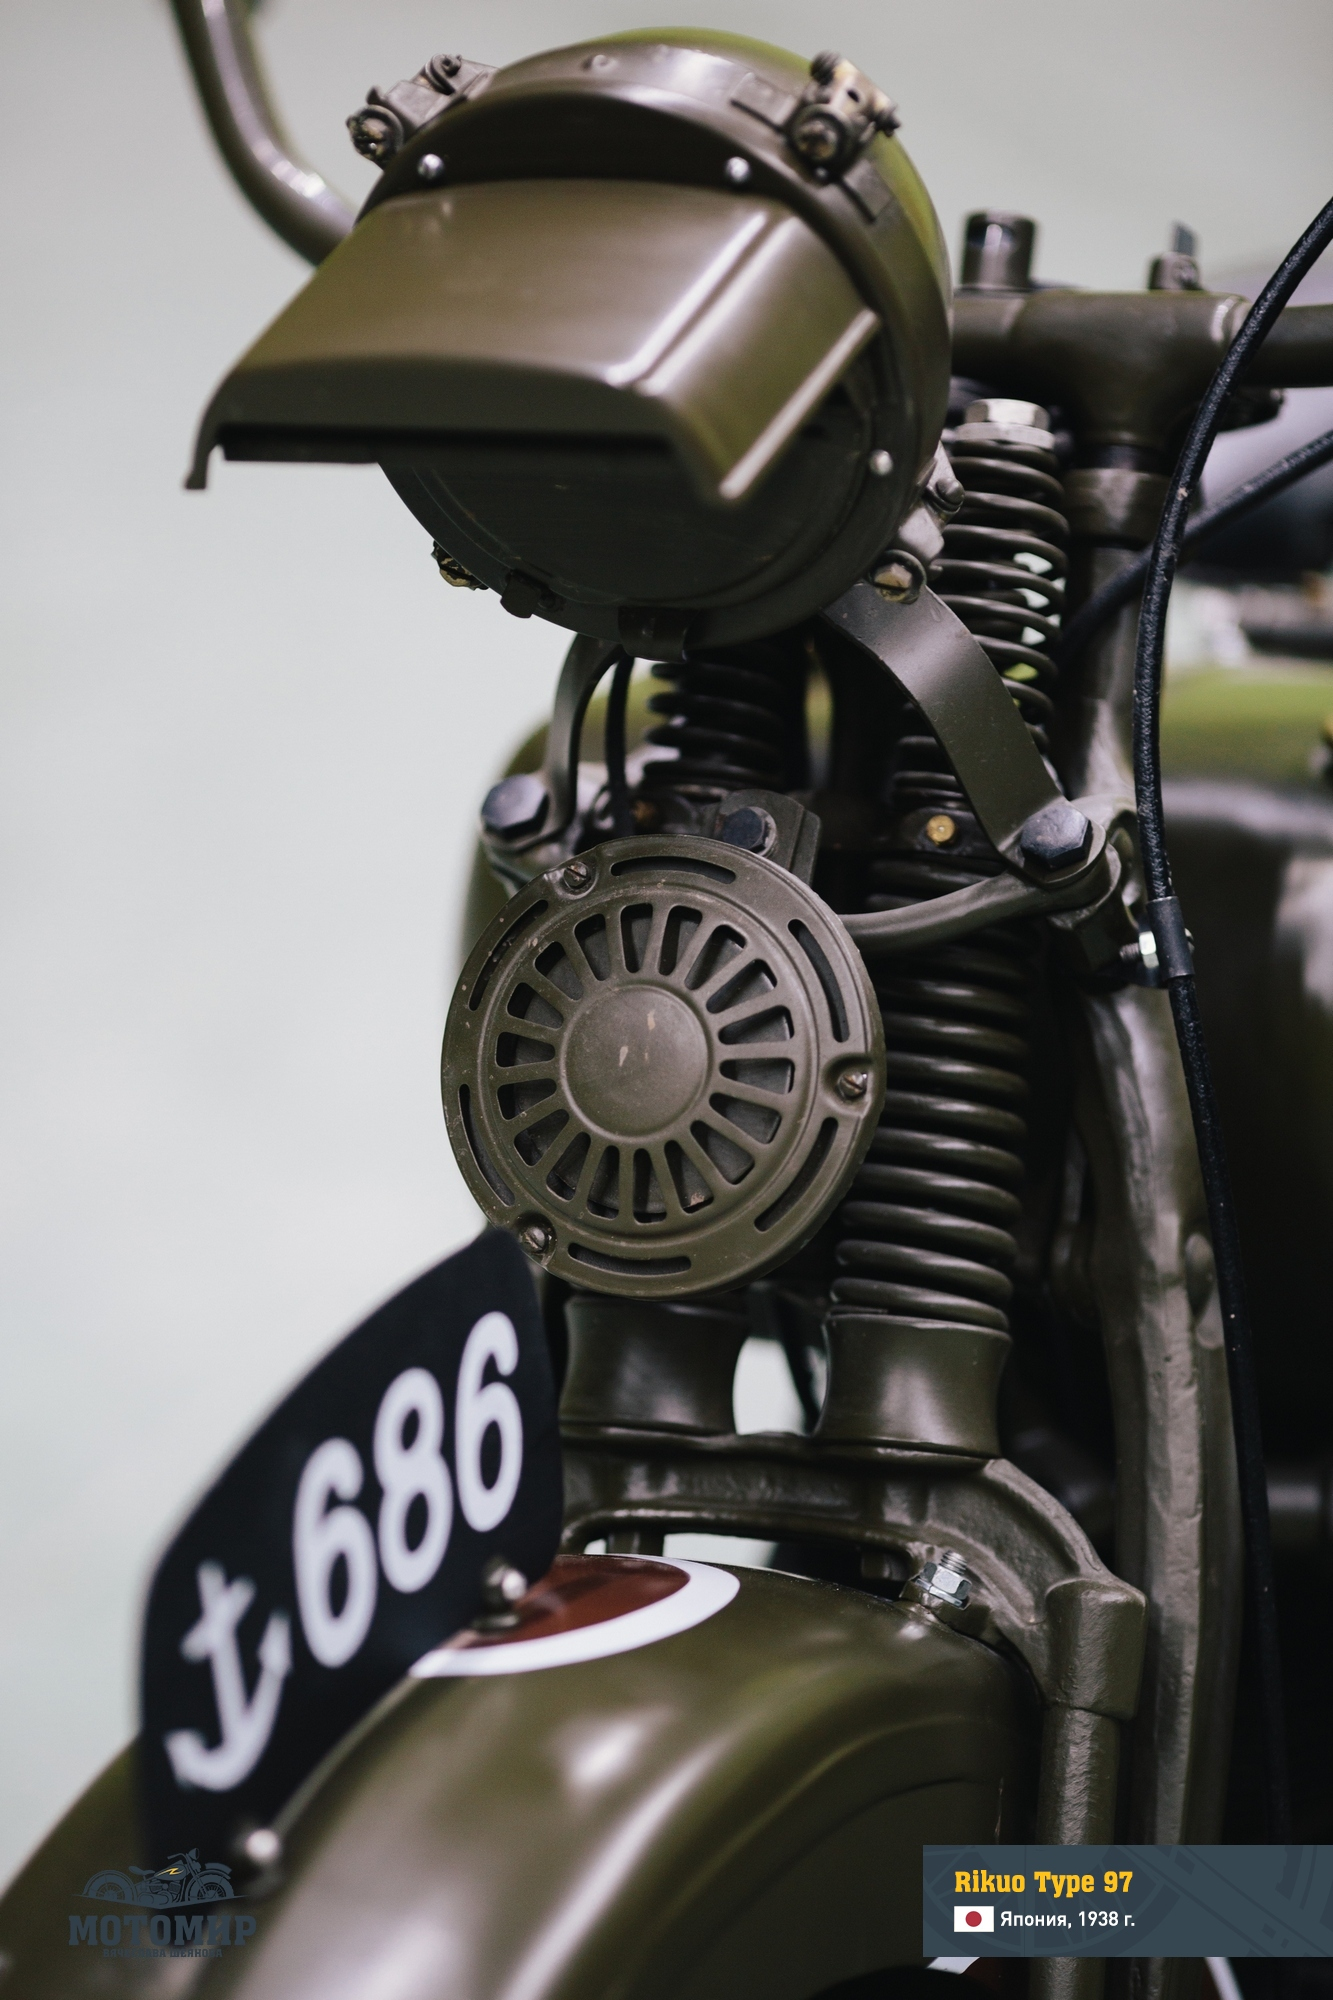 rikuo-type-97-1938-201502-web-11